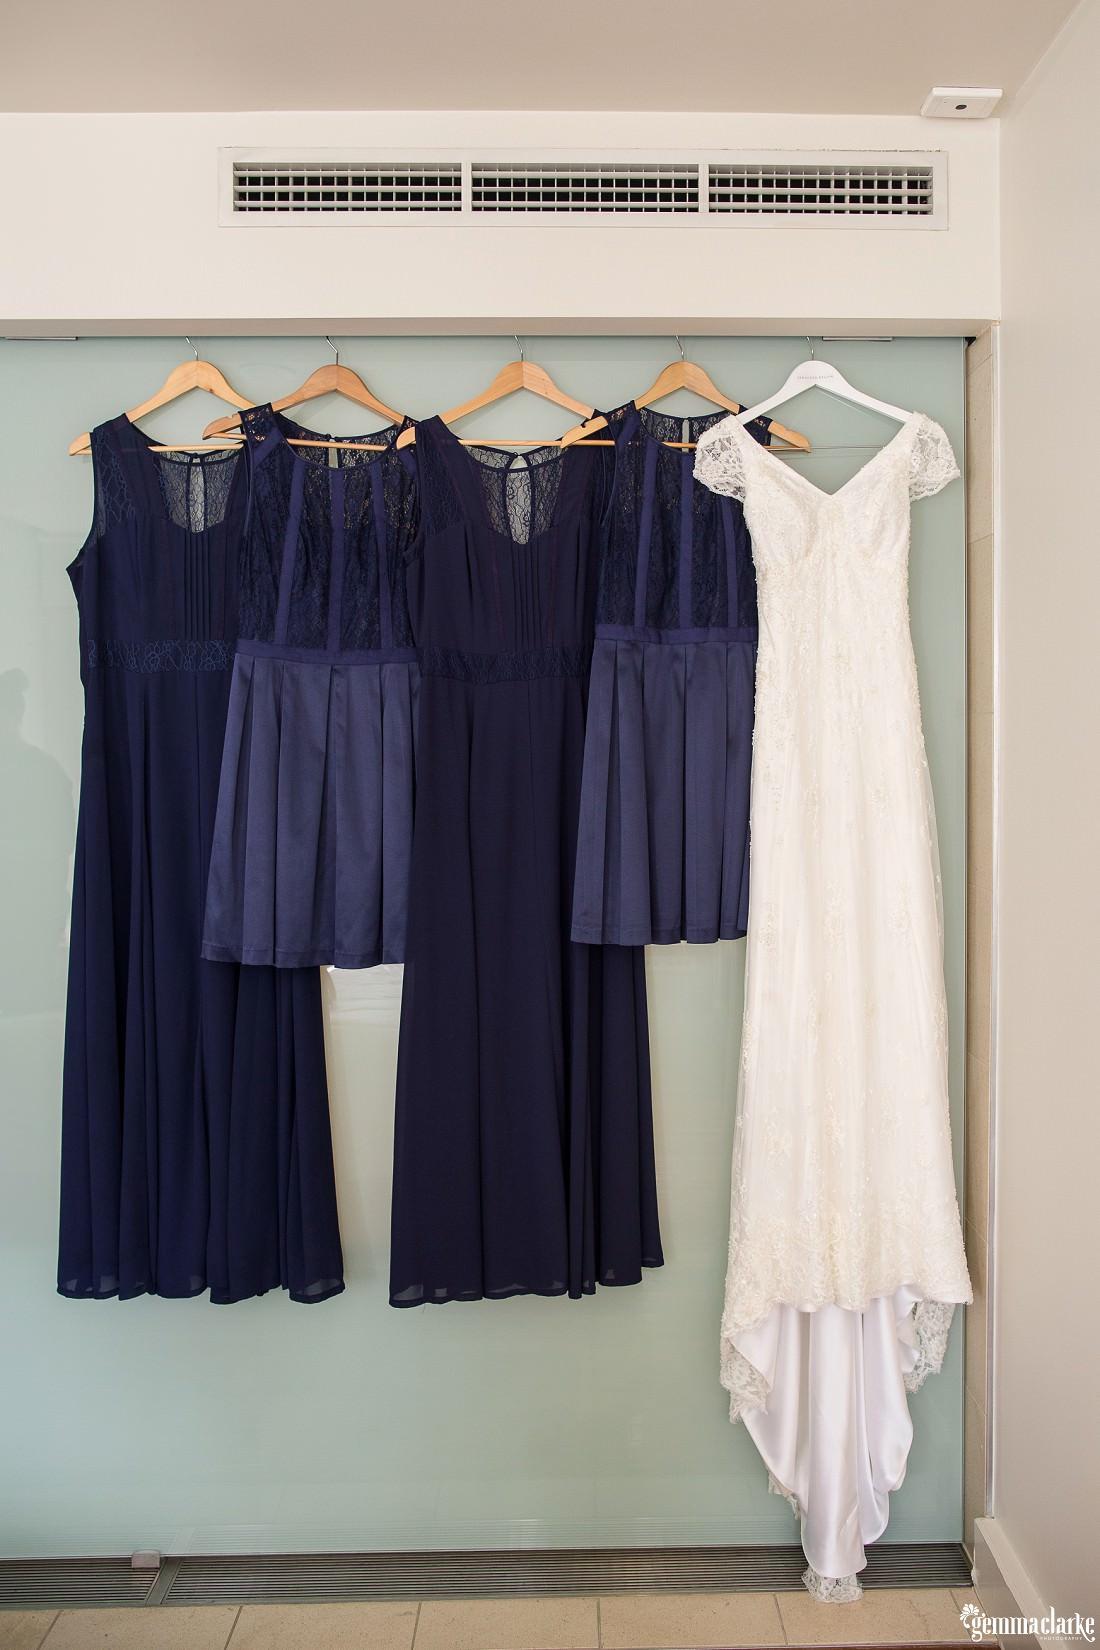 gemma-clarke-photography_gunners-barracks-wedding_tearooms-wedding_danielle-and-campbell_0008